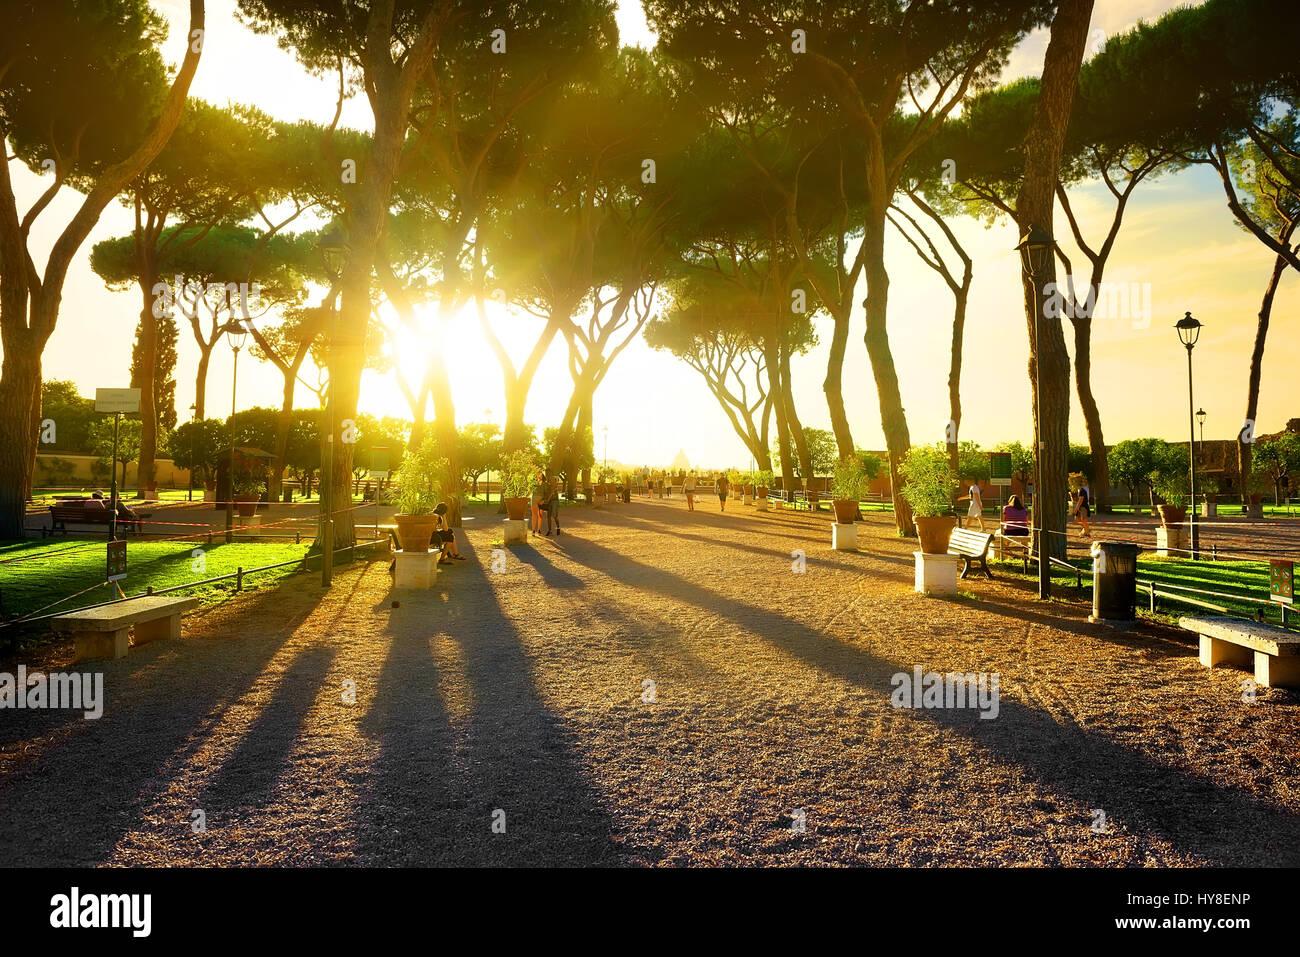 Giardino degli aranci in rome at sunset italy stock photo 137255490 alamy - Giardino degli aranci frattamaggiore ...